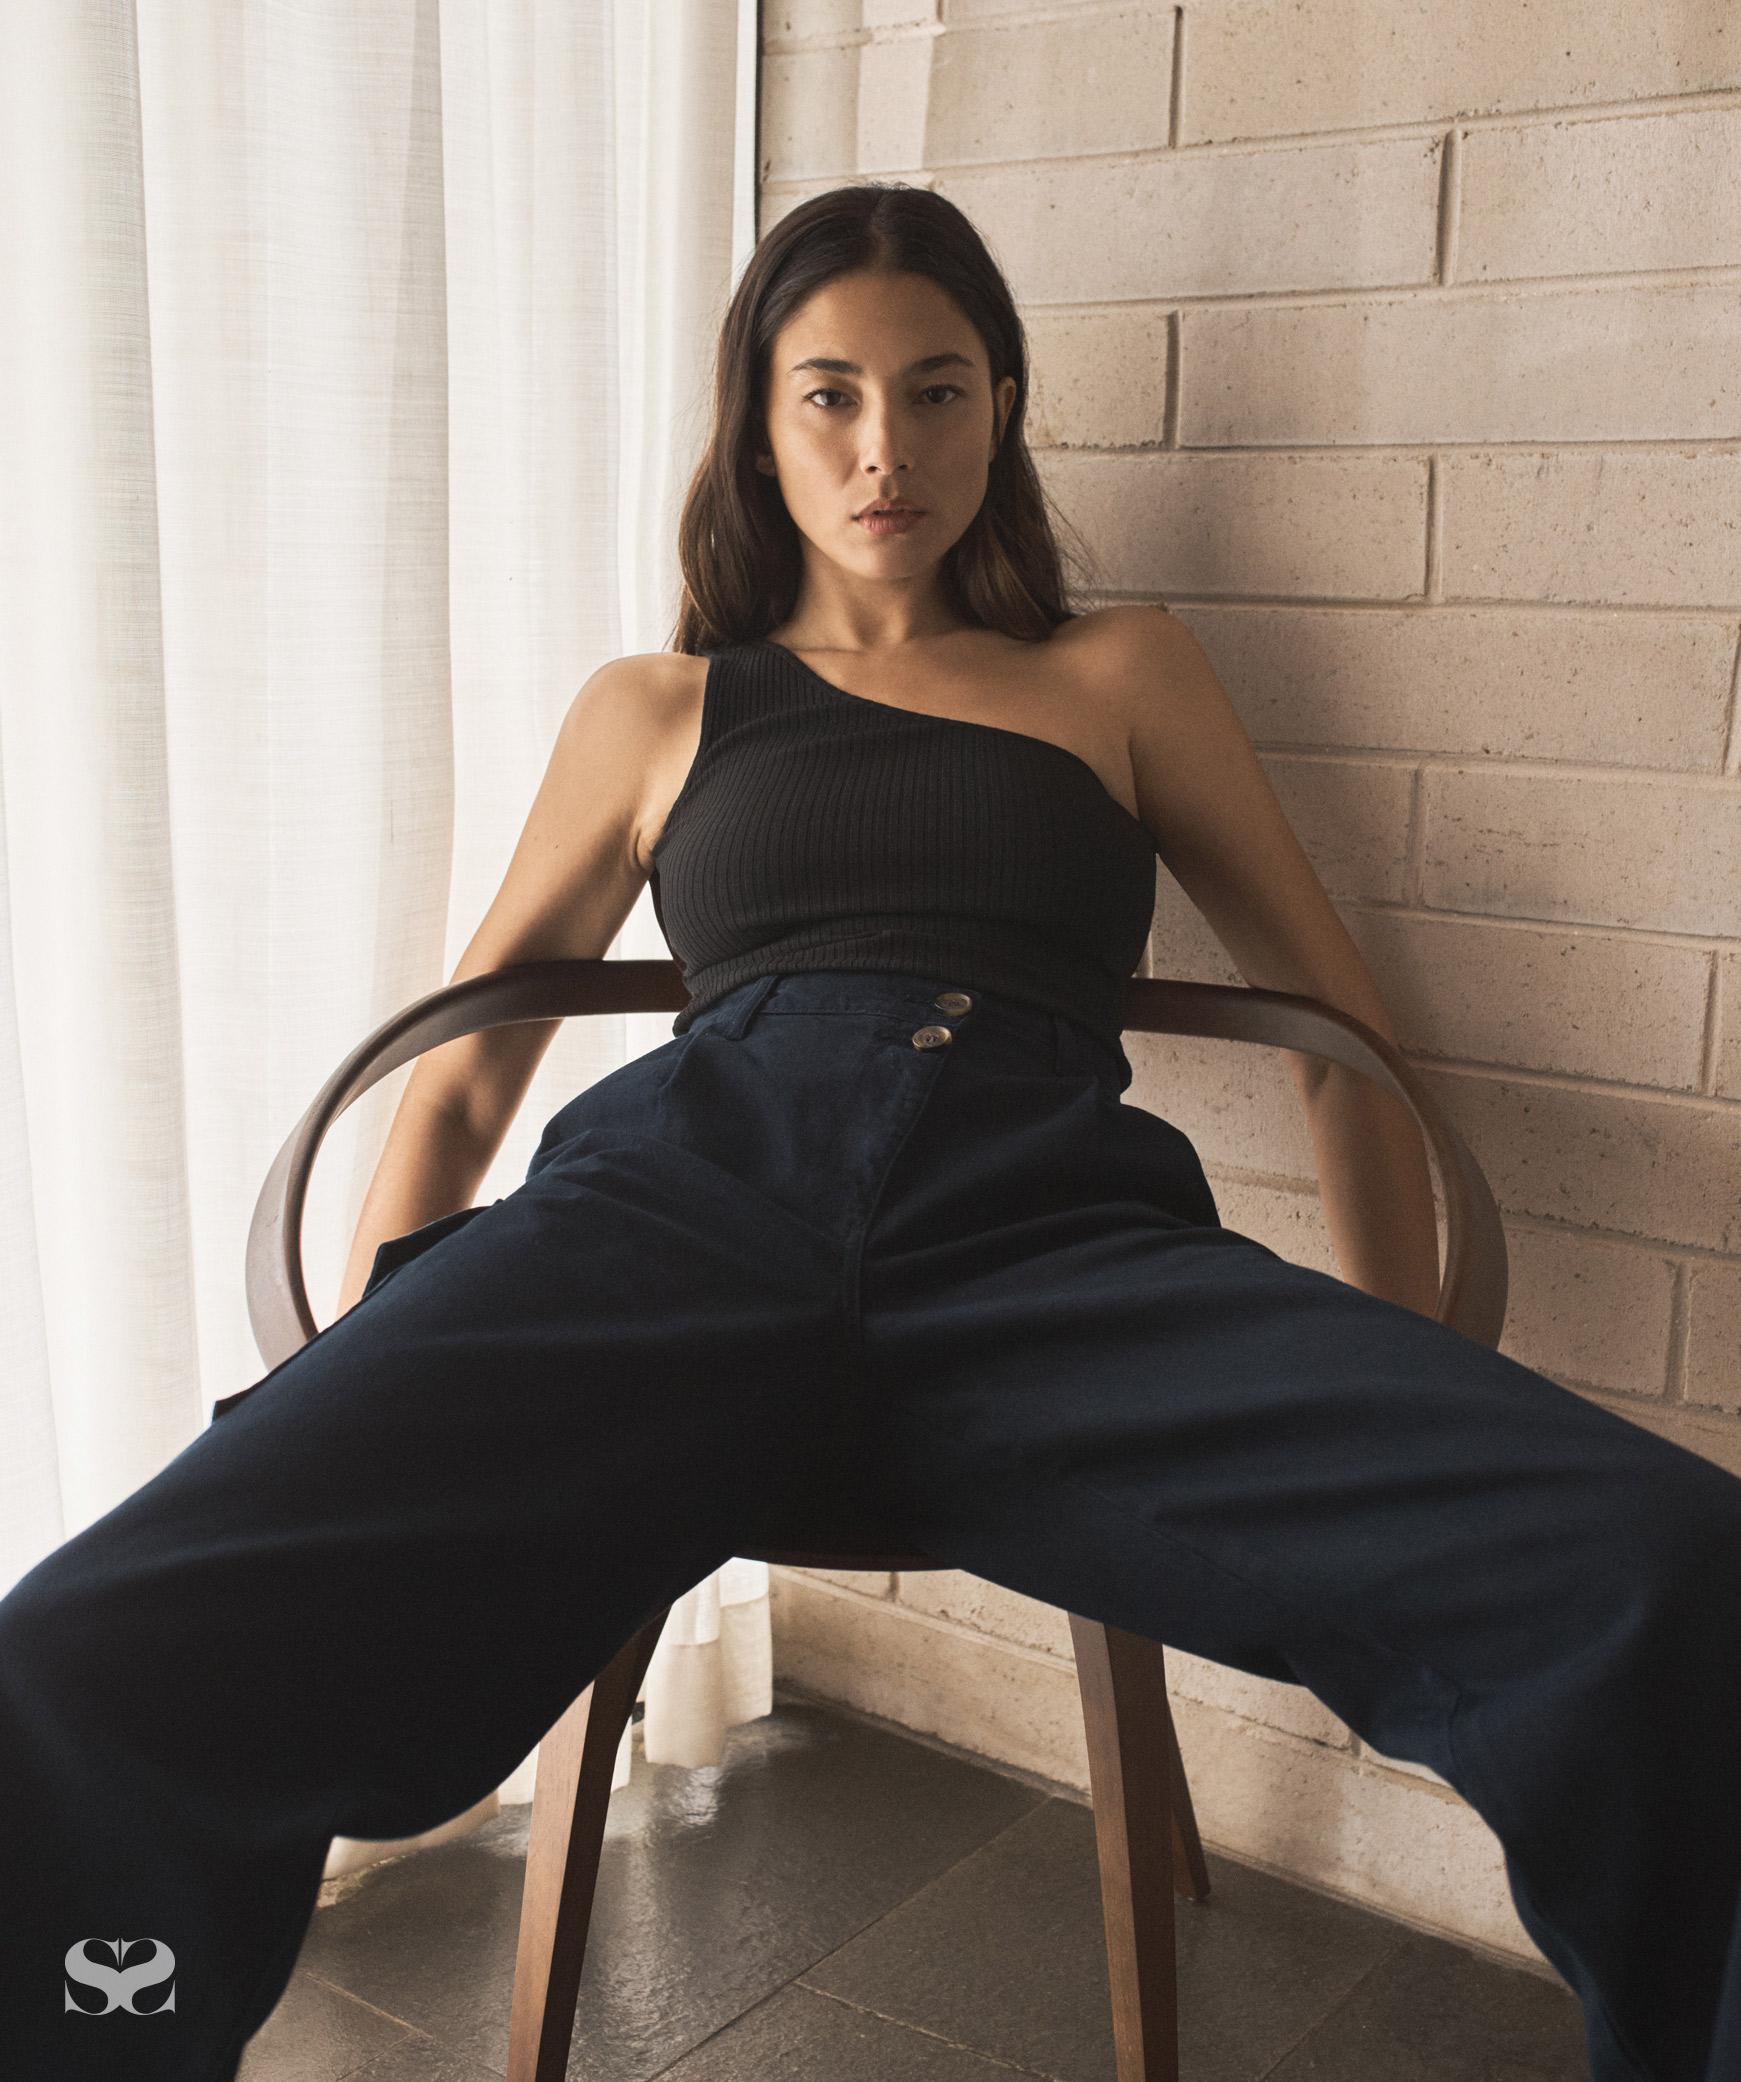 Jessica Gomes sitting